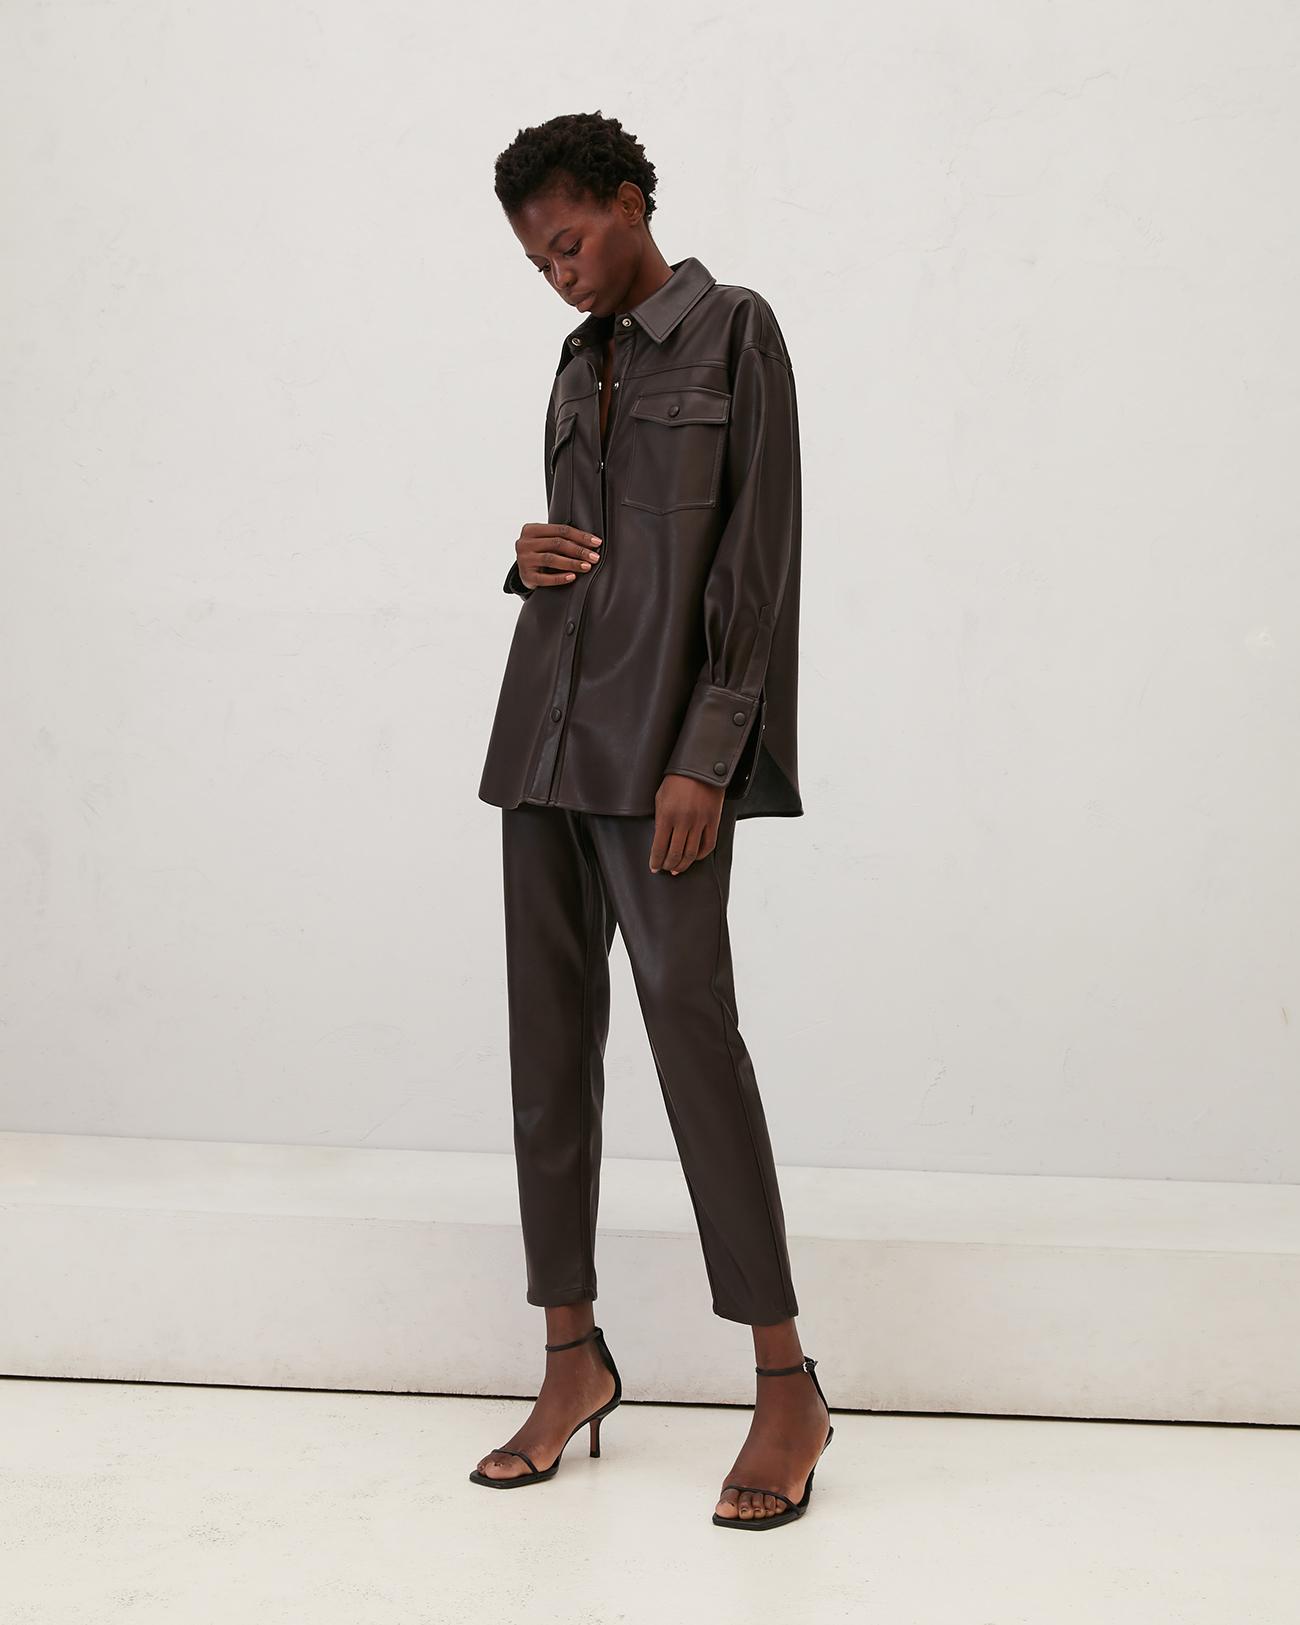 Рубашка из эко-кожи цвета горький шоколад фото